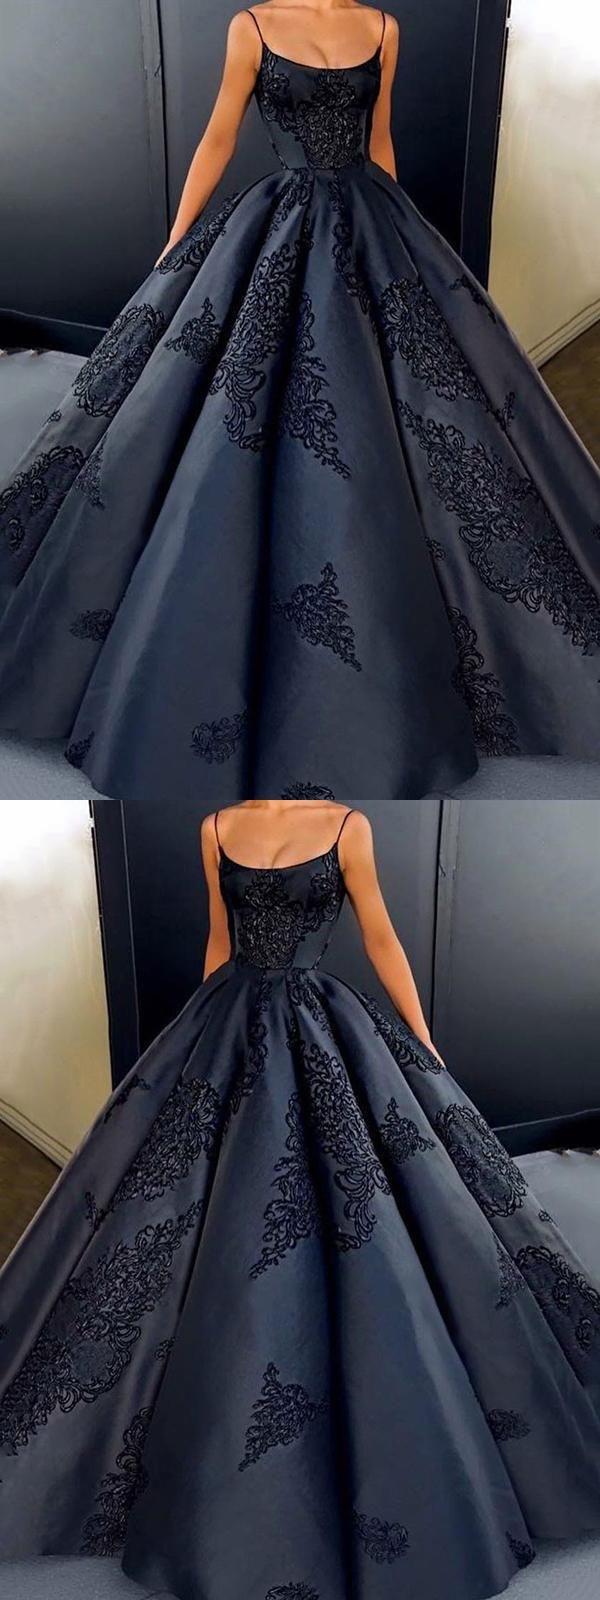 prom dress ball gown, prom dress lace #prom #dress #ball